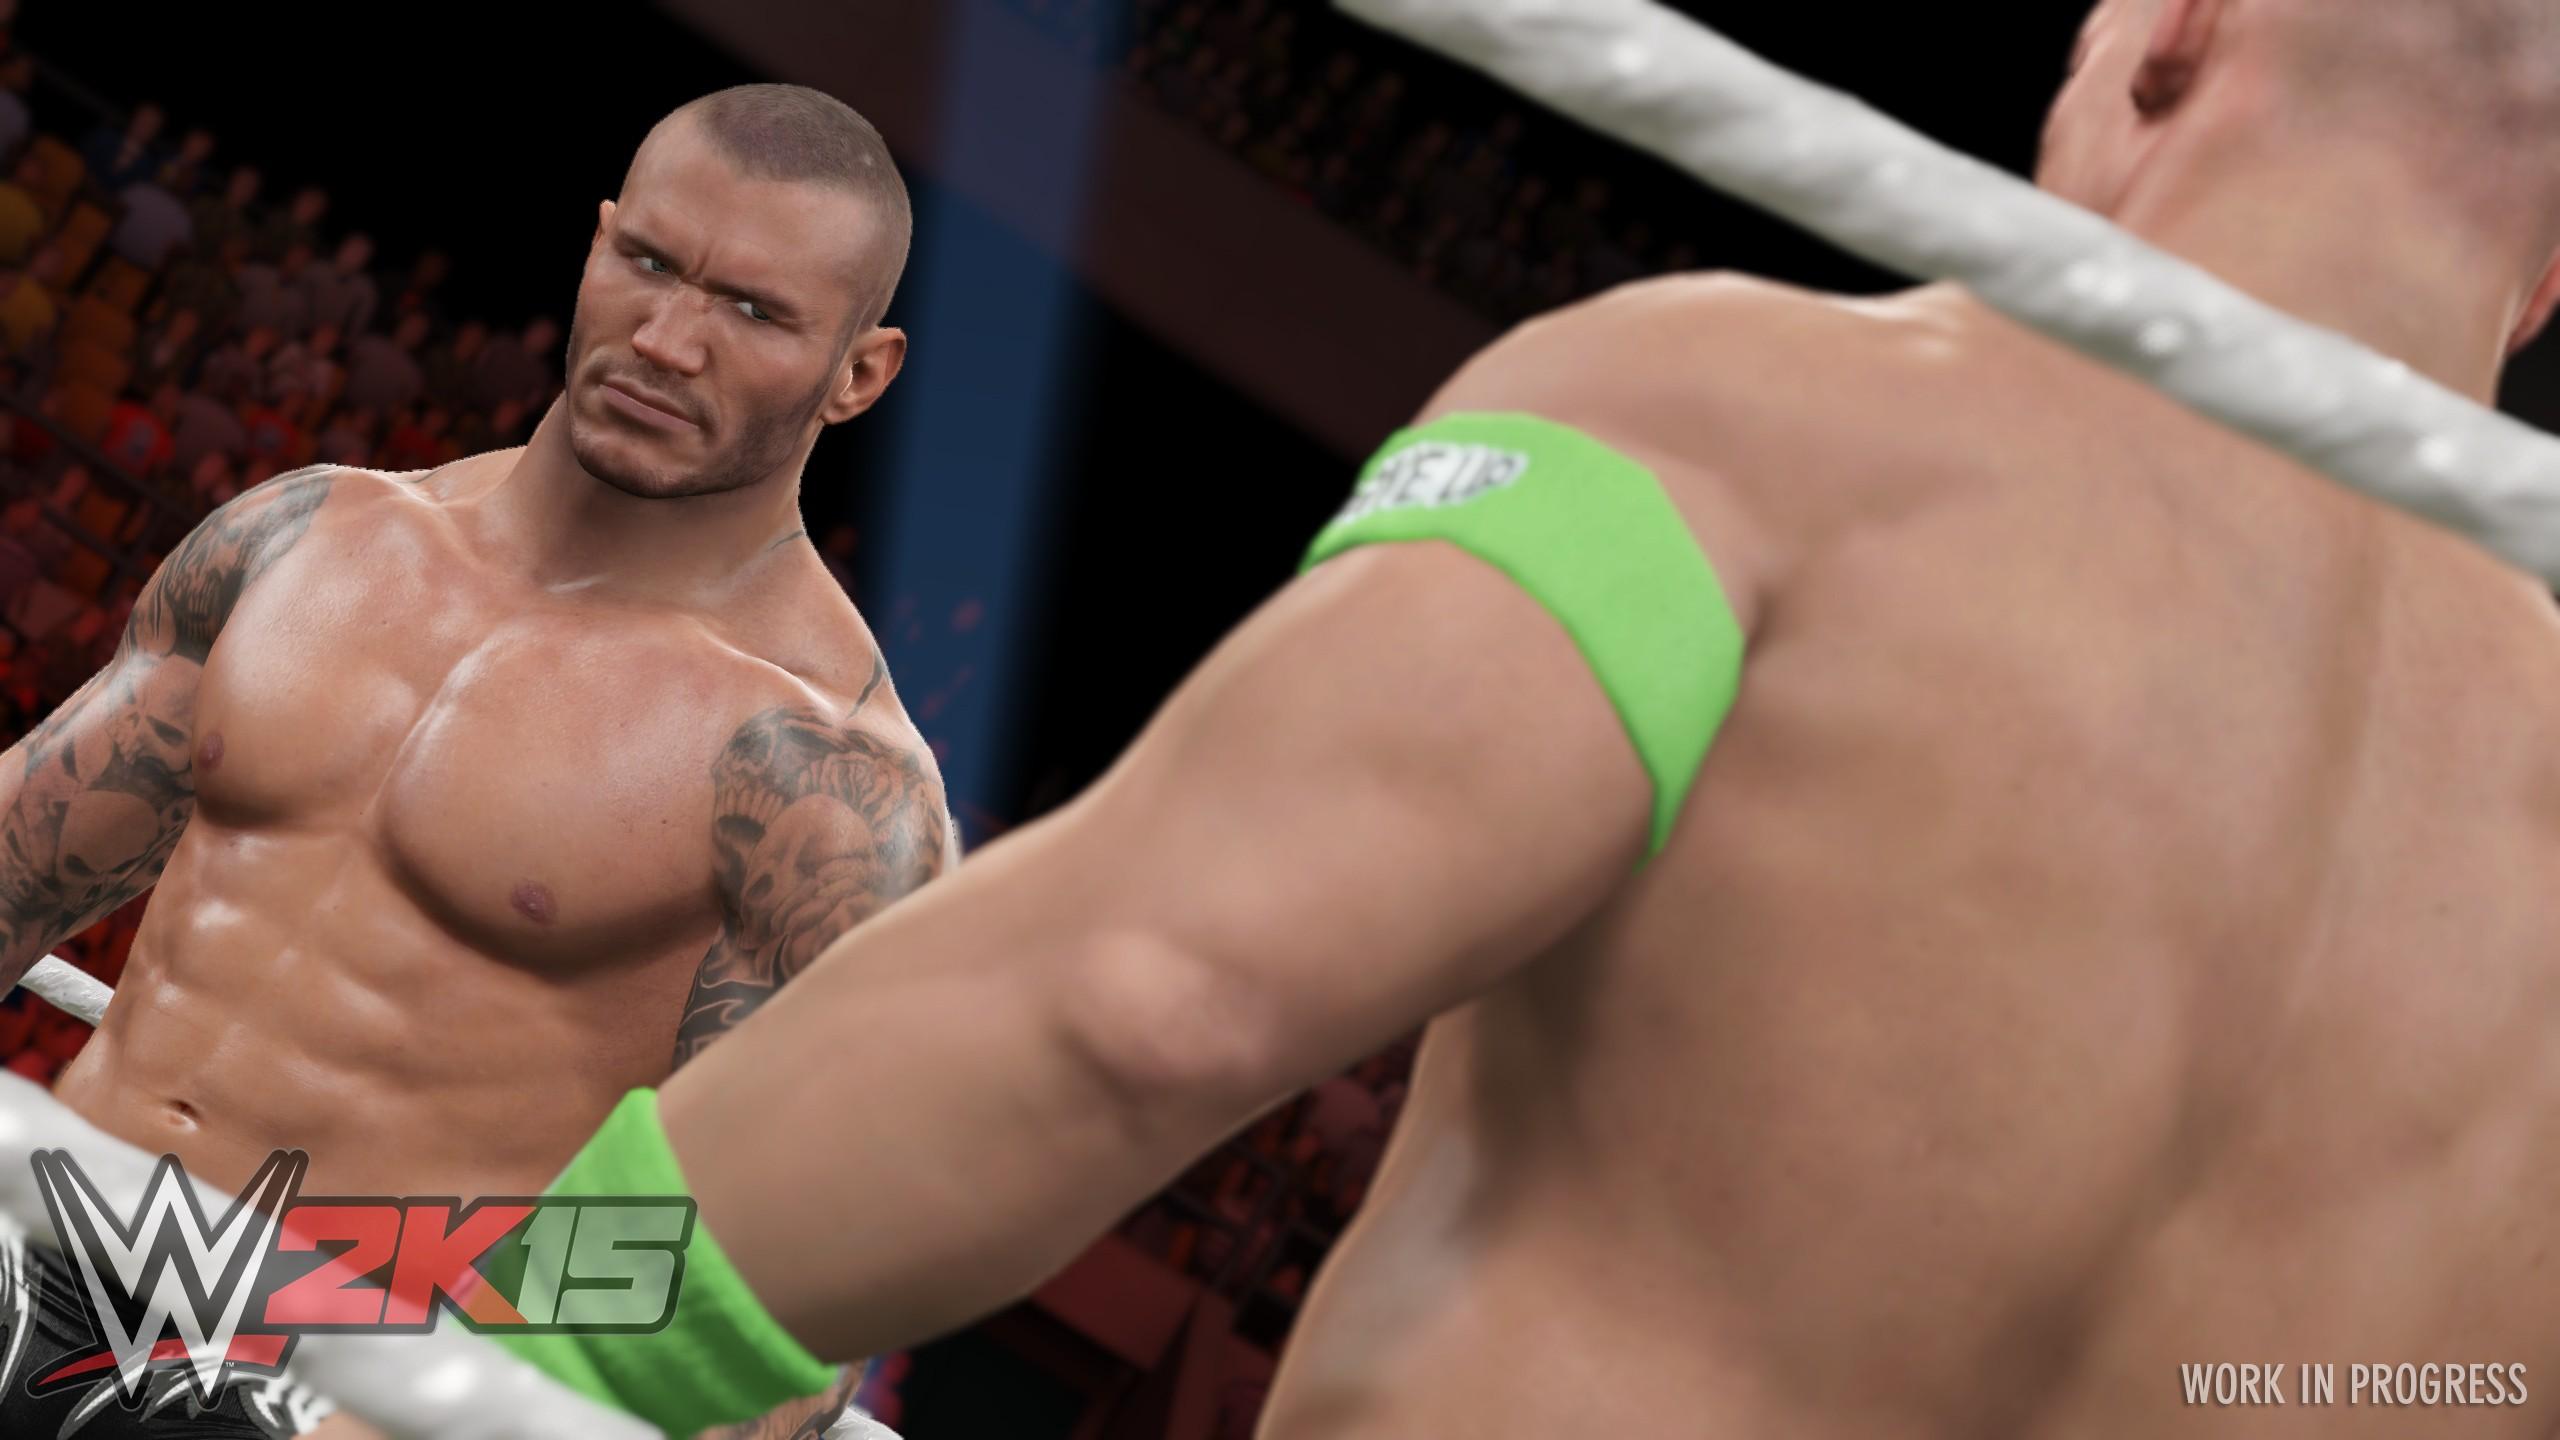 Wwe 2k15 Randy Orton Retro Randy Orton in Wwe 2k15